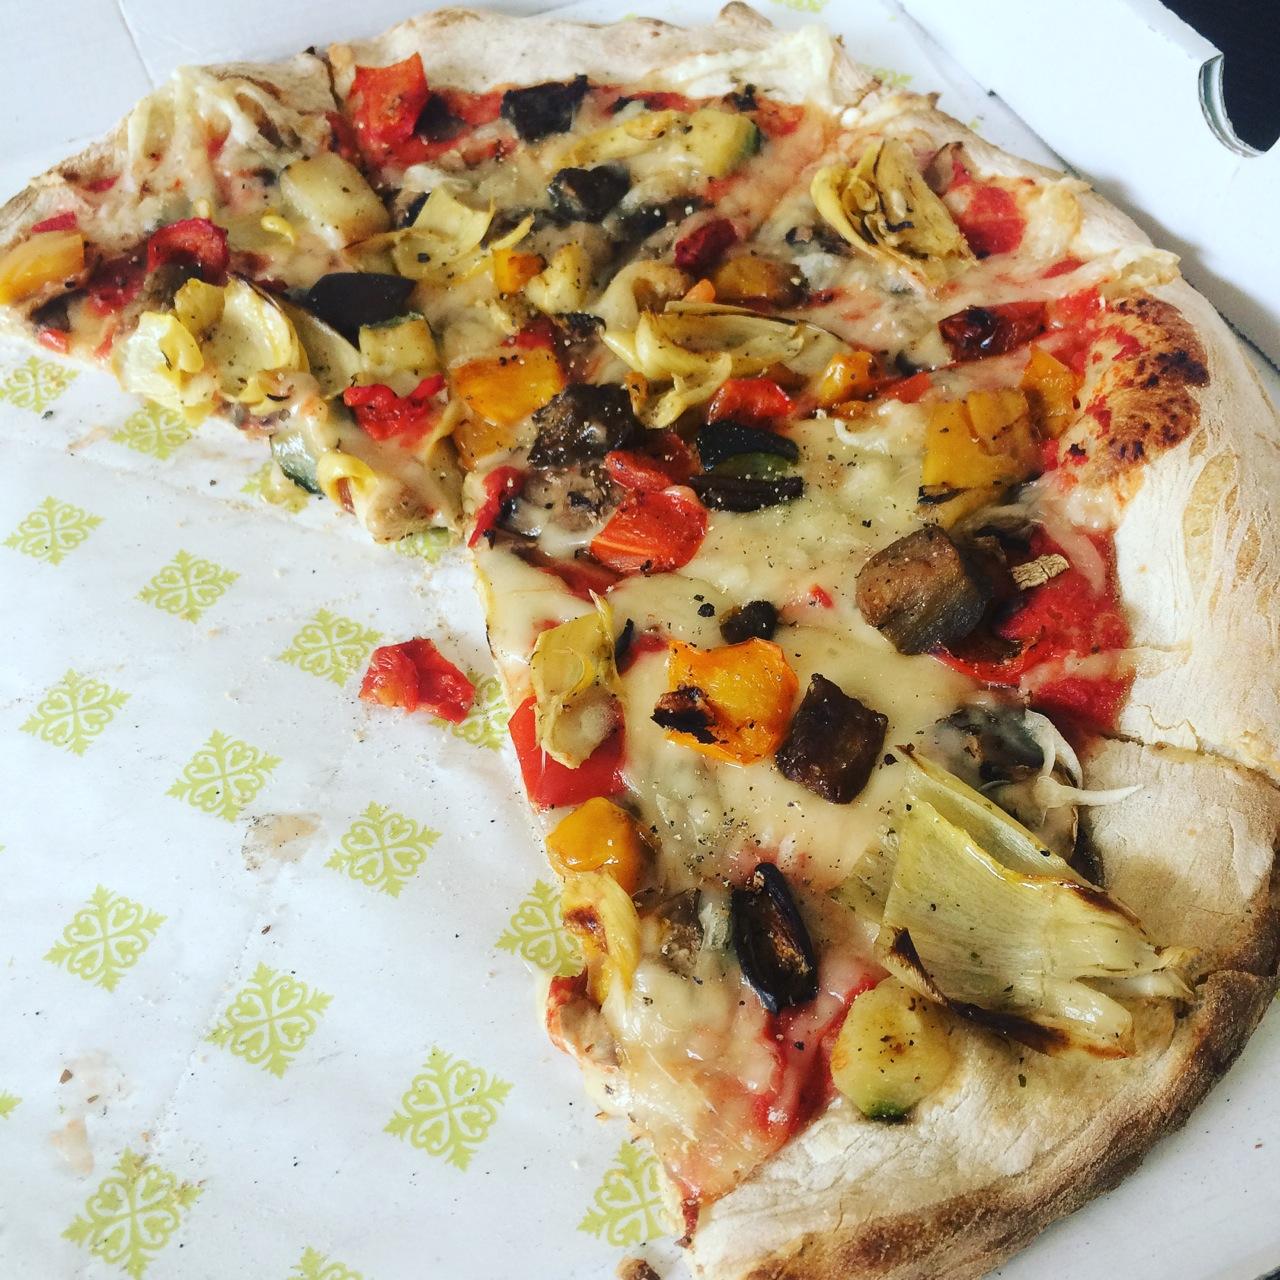 http://i1.wp.com/fatgayvegan.com/wp-content/uploads/2015/09/firezza-vegan-pizza.jpg?fit=1280%2C1280